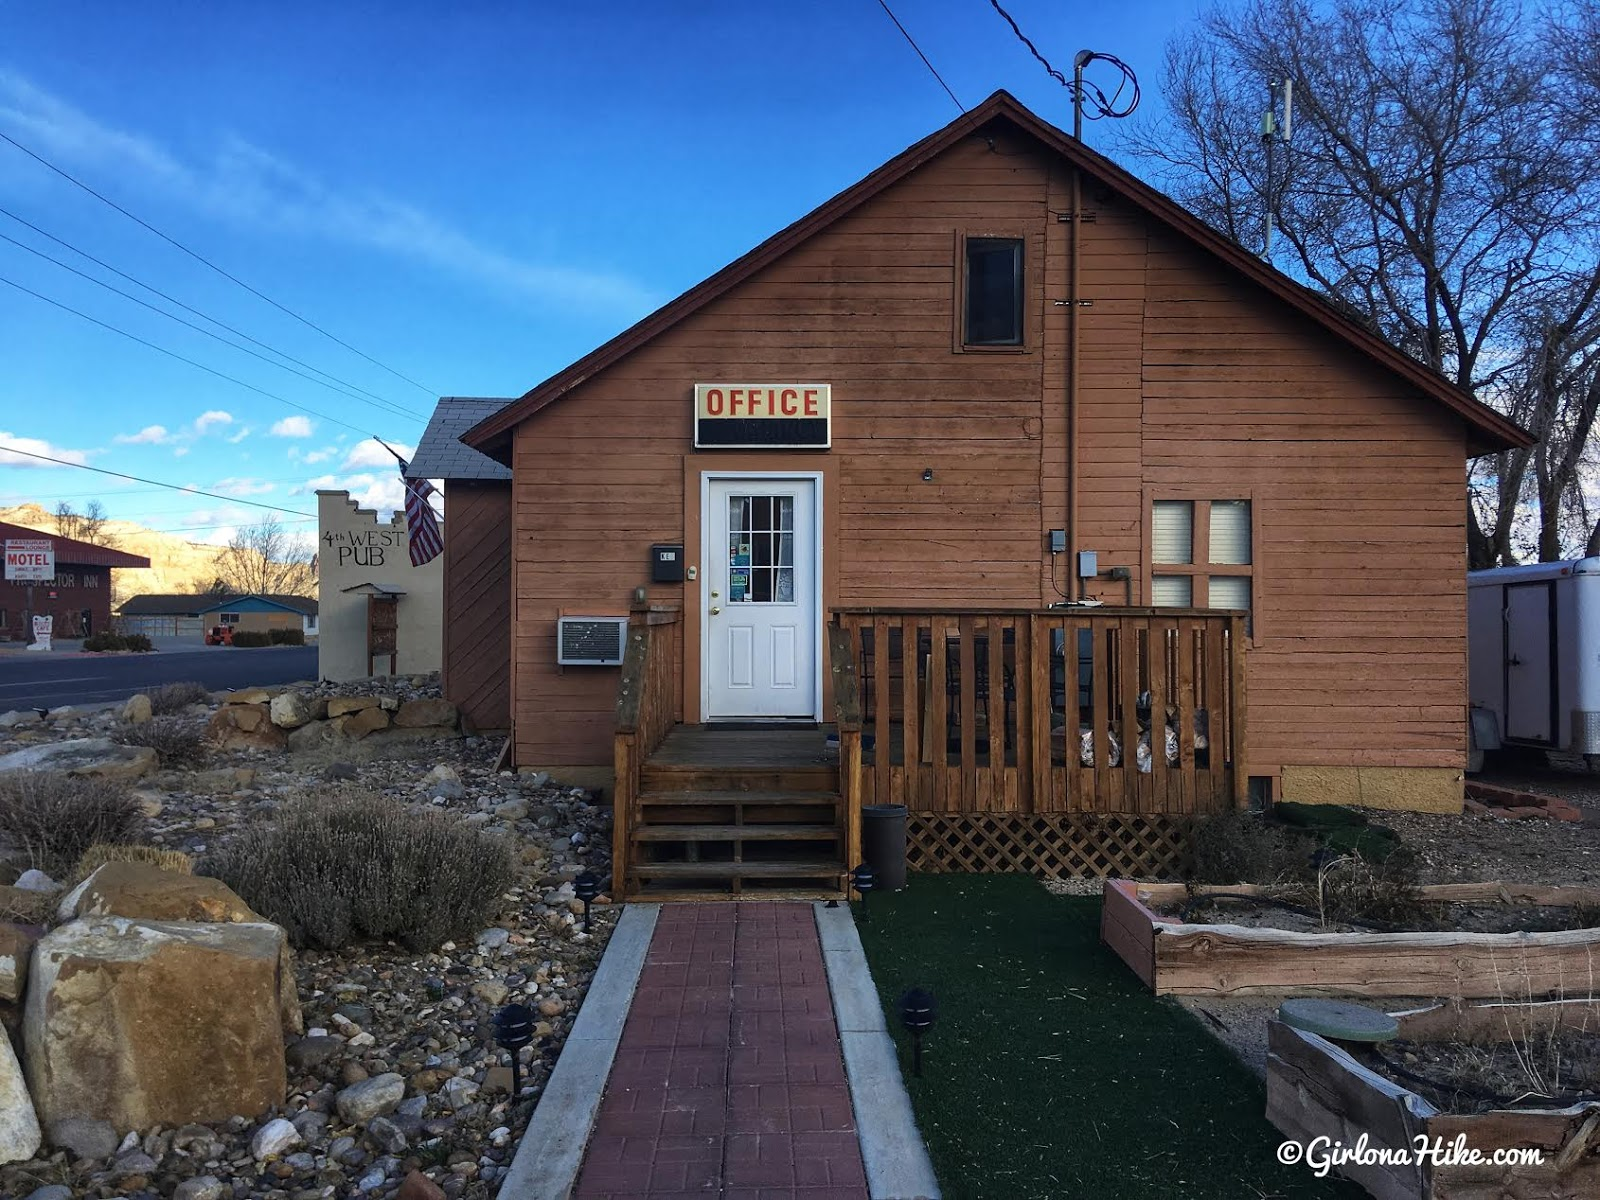 Lodging Review: Circle D Hotel, Escalante , Utah